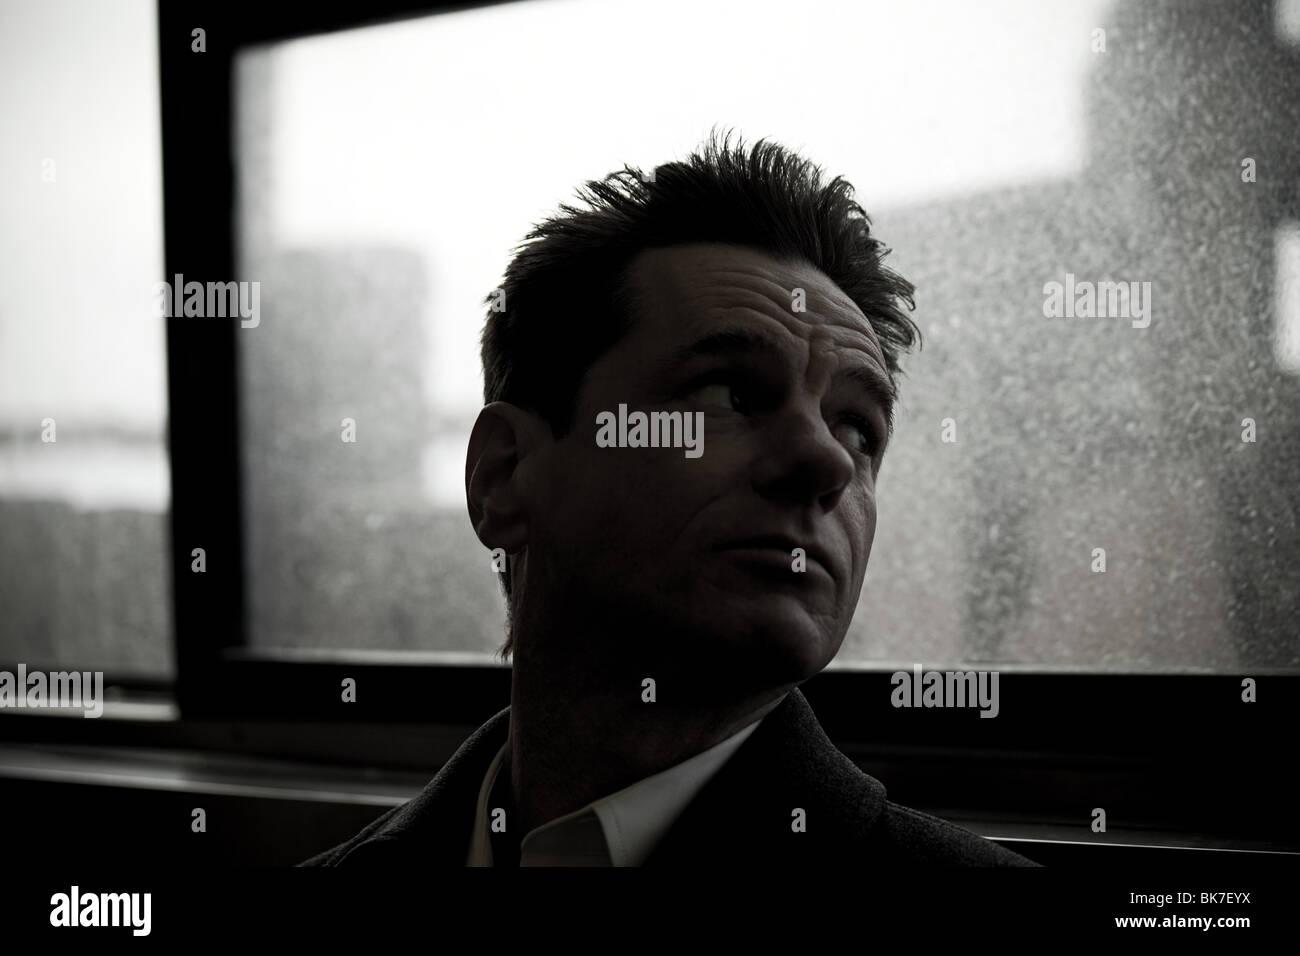 Man on staten island ferry - Stock Image